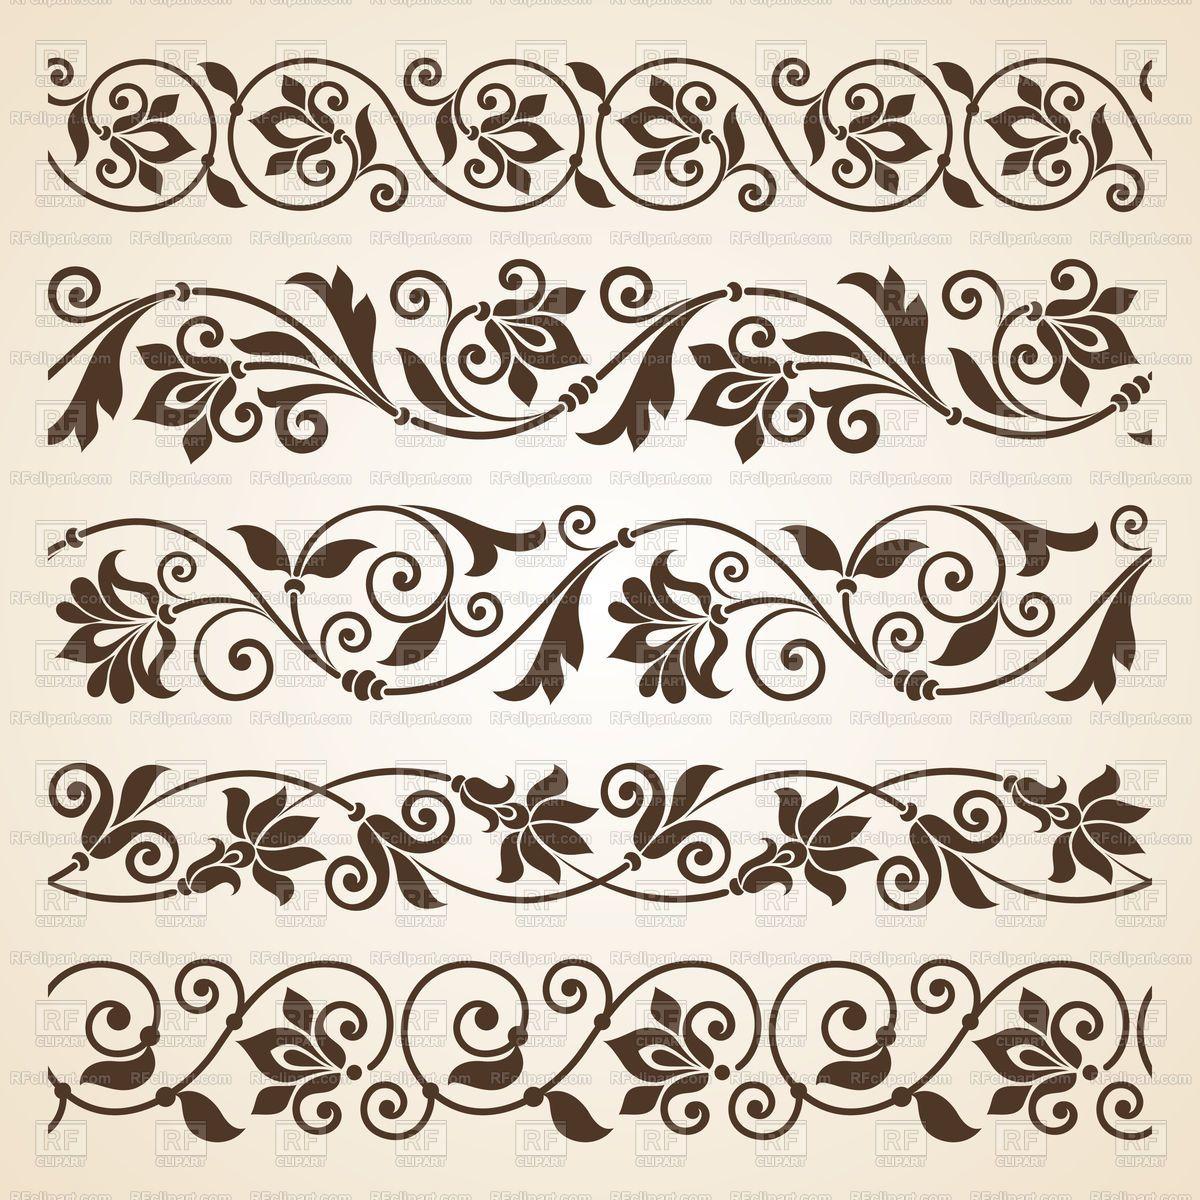 Best Of Vintage Flower Vector Border And Review 2020 Nakis Desenleri El Kina Sanat Desen